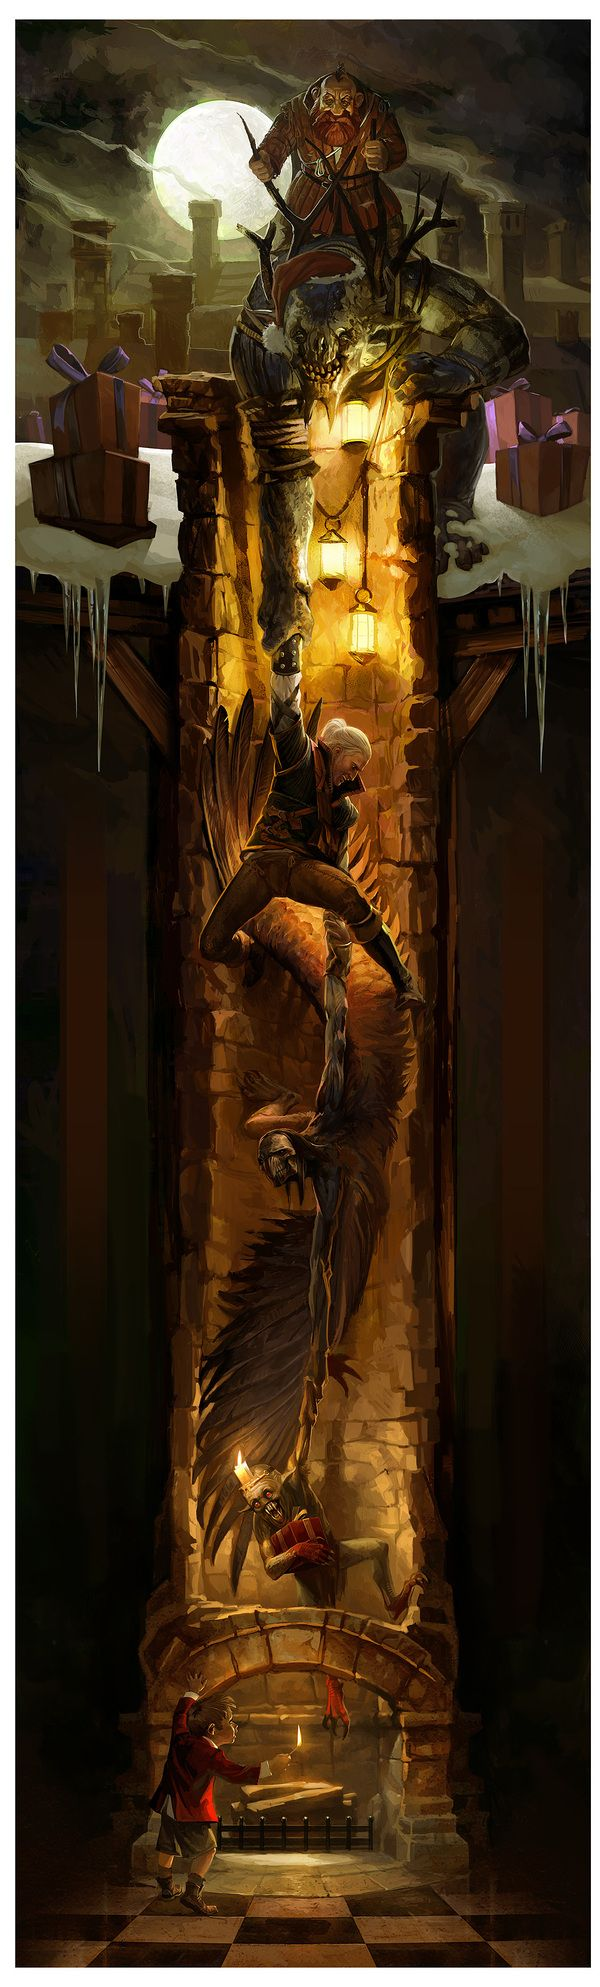 The Witcher Christmas Card 2011 by Bartek Gawel, via Behance